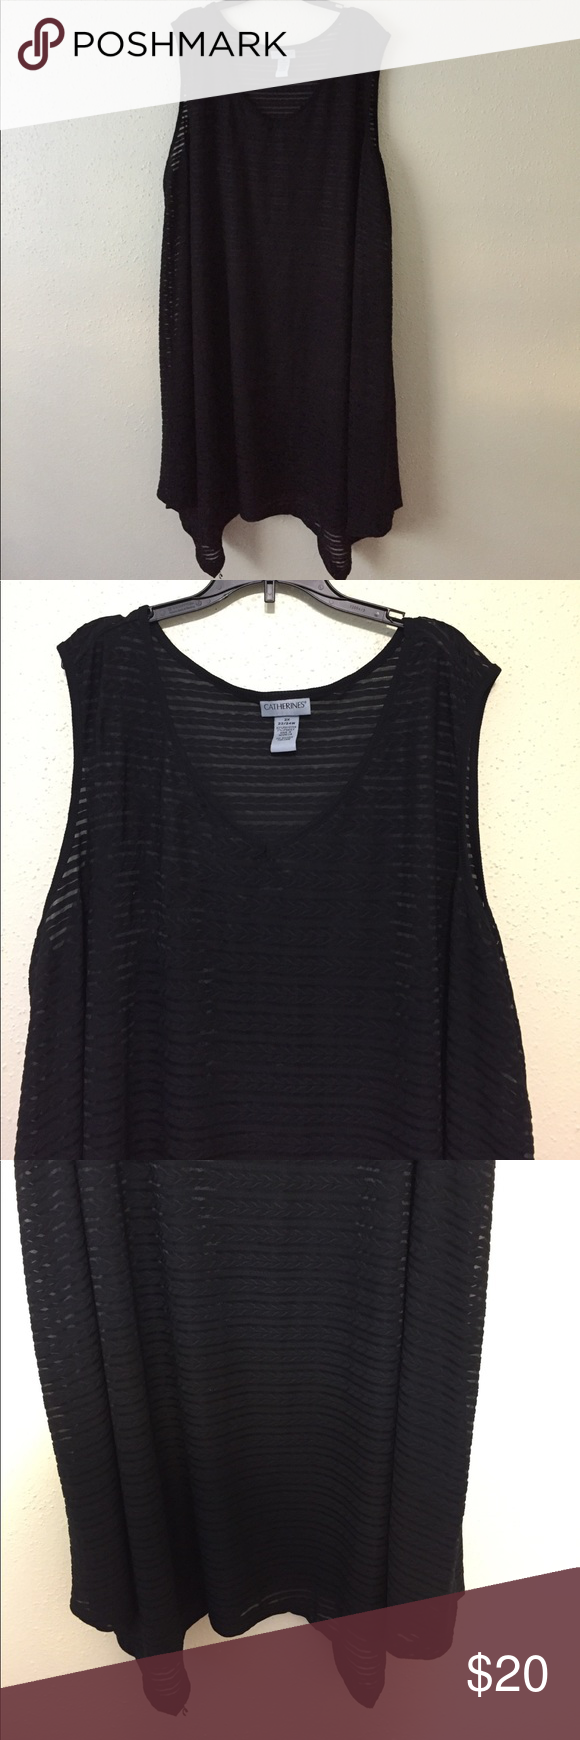 Catherineus swim sheer black coverup swim cover polyester spandex